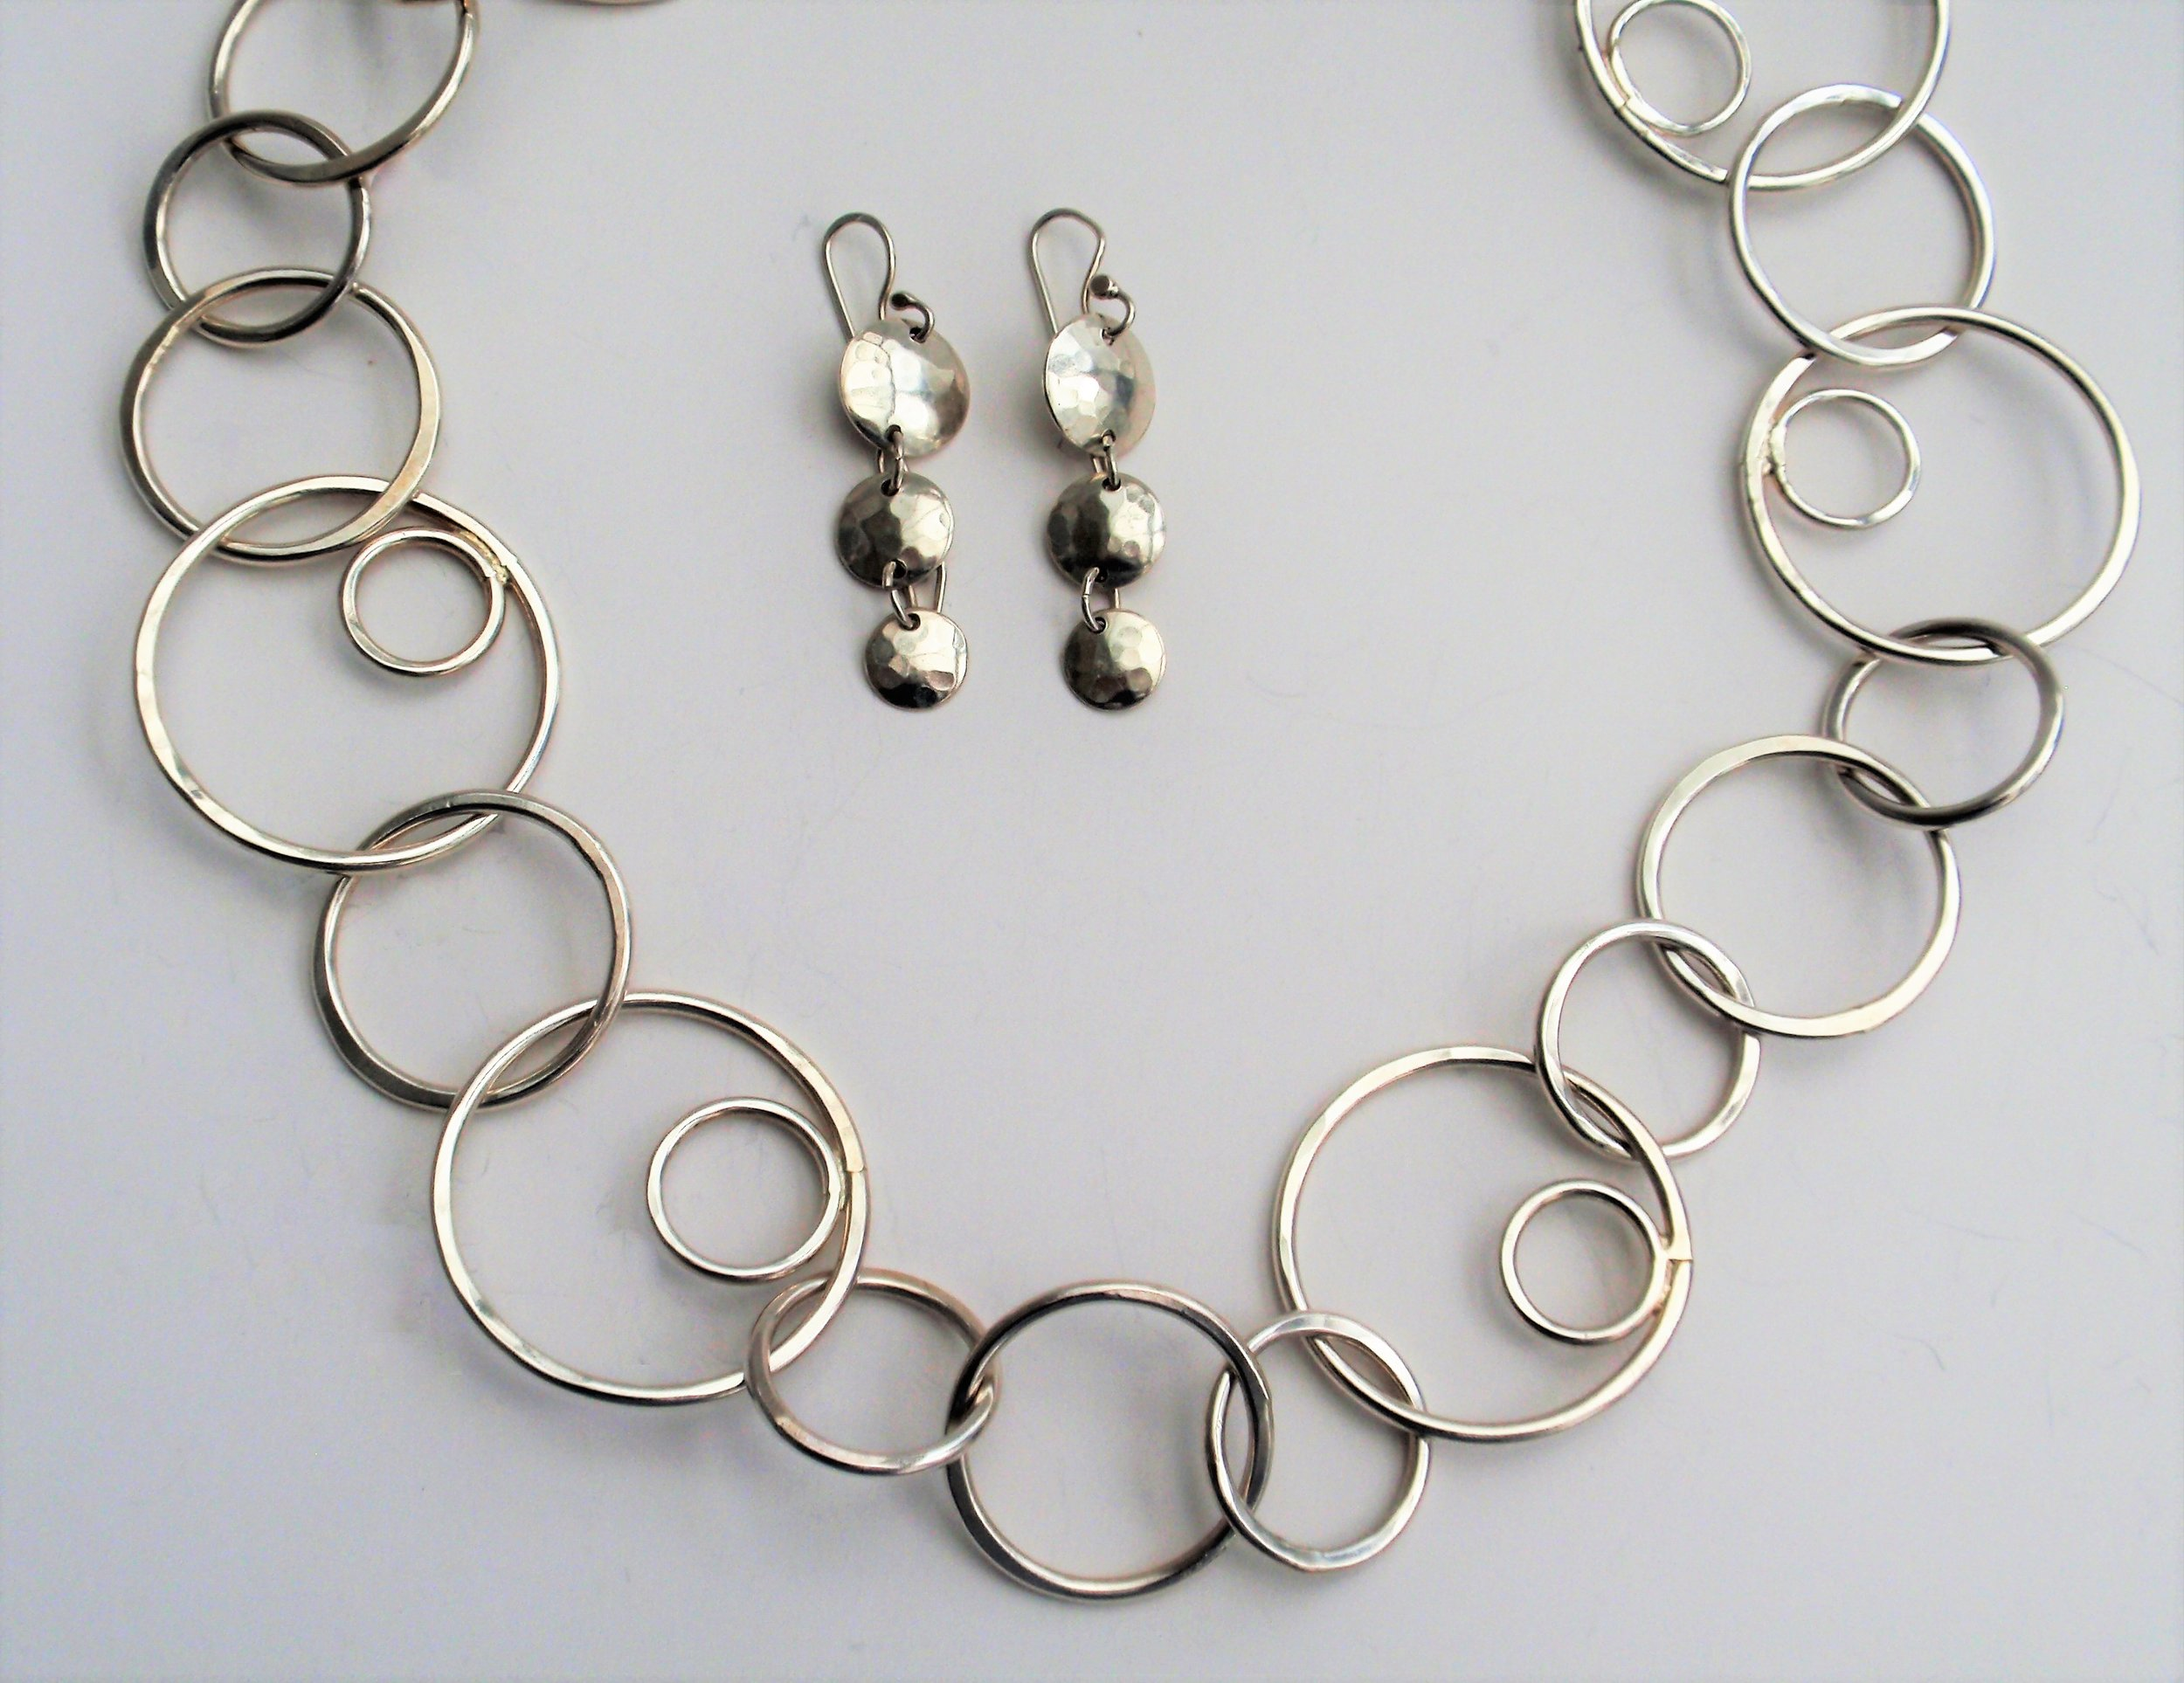 sandy ball website loop necklace.JPG